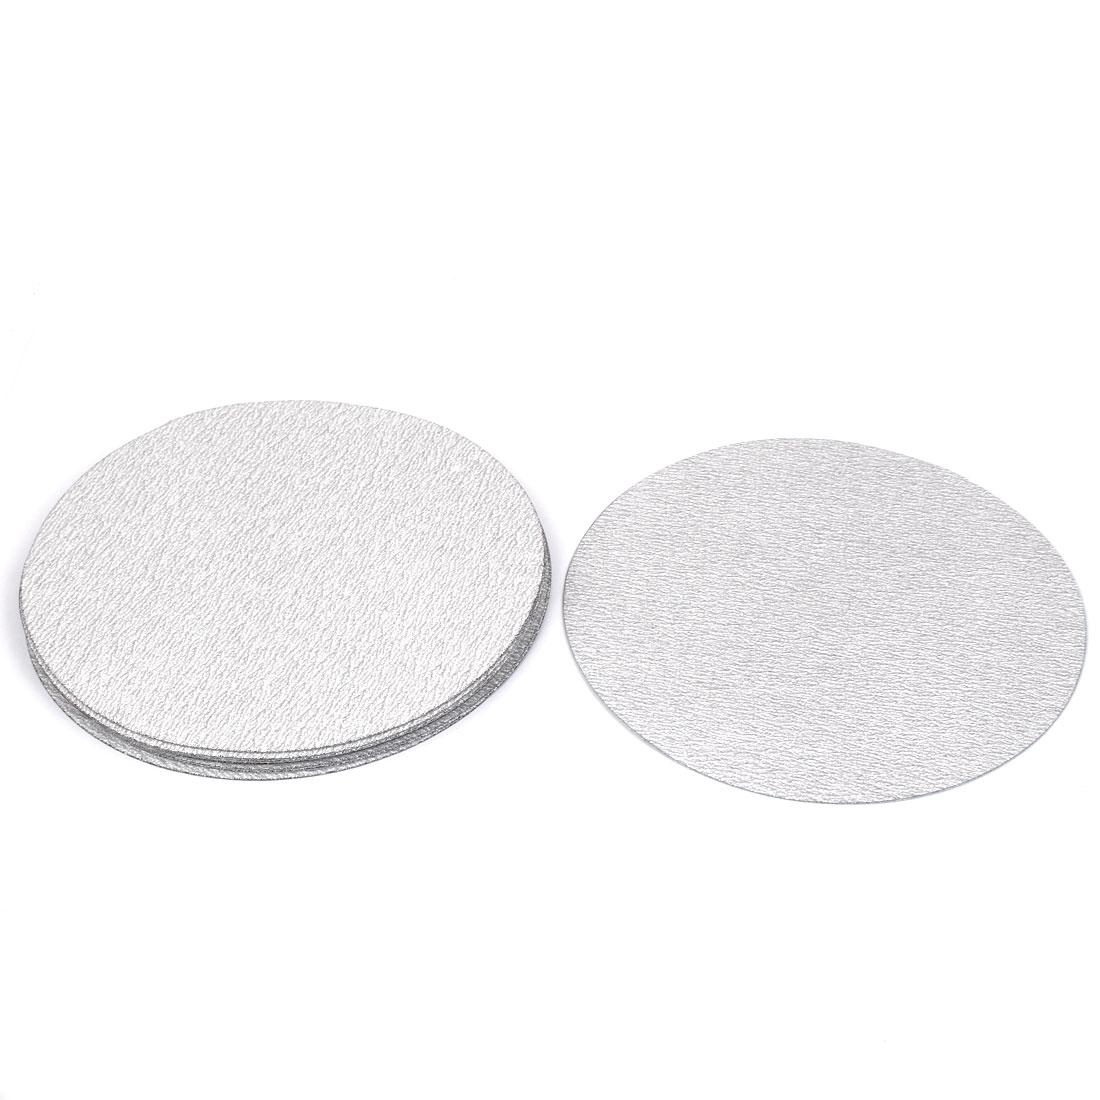 "7"" Dia Polishing Round Dry Abrasive Sanding Sandpaper Sheet Disc 240 Grit 10pcs"